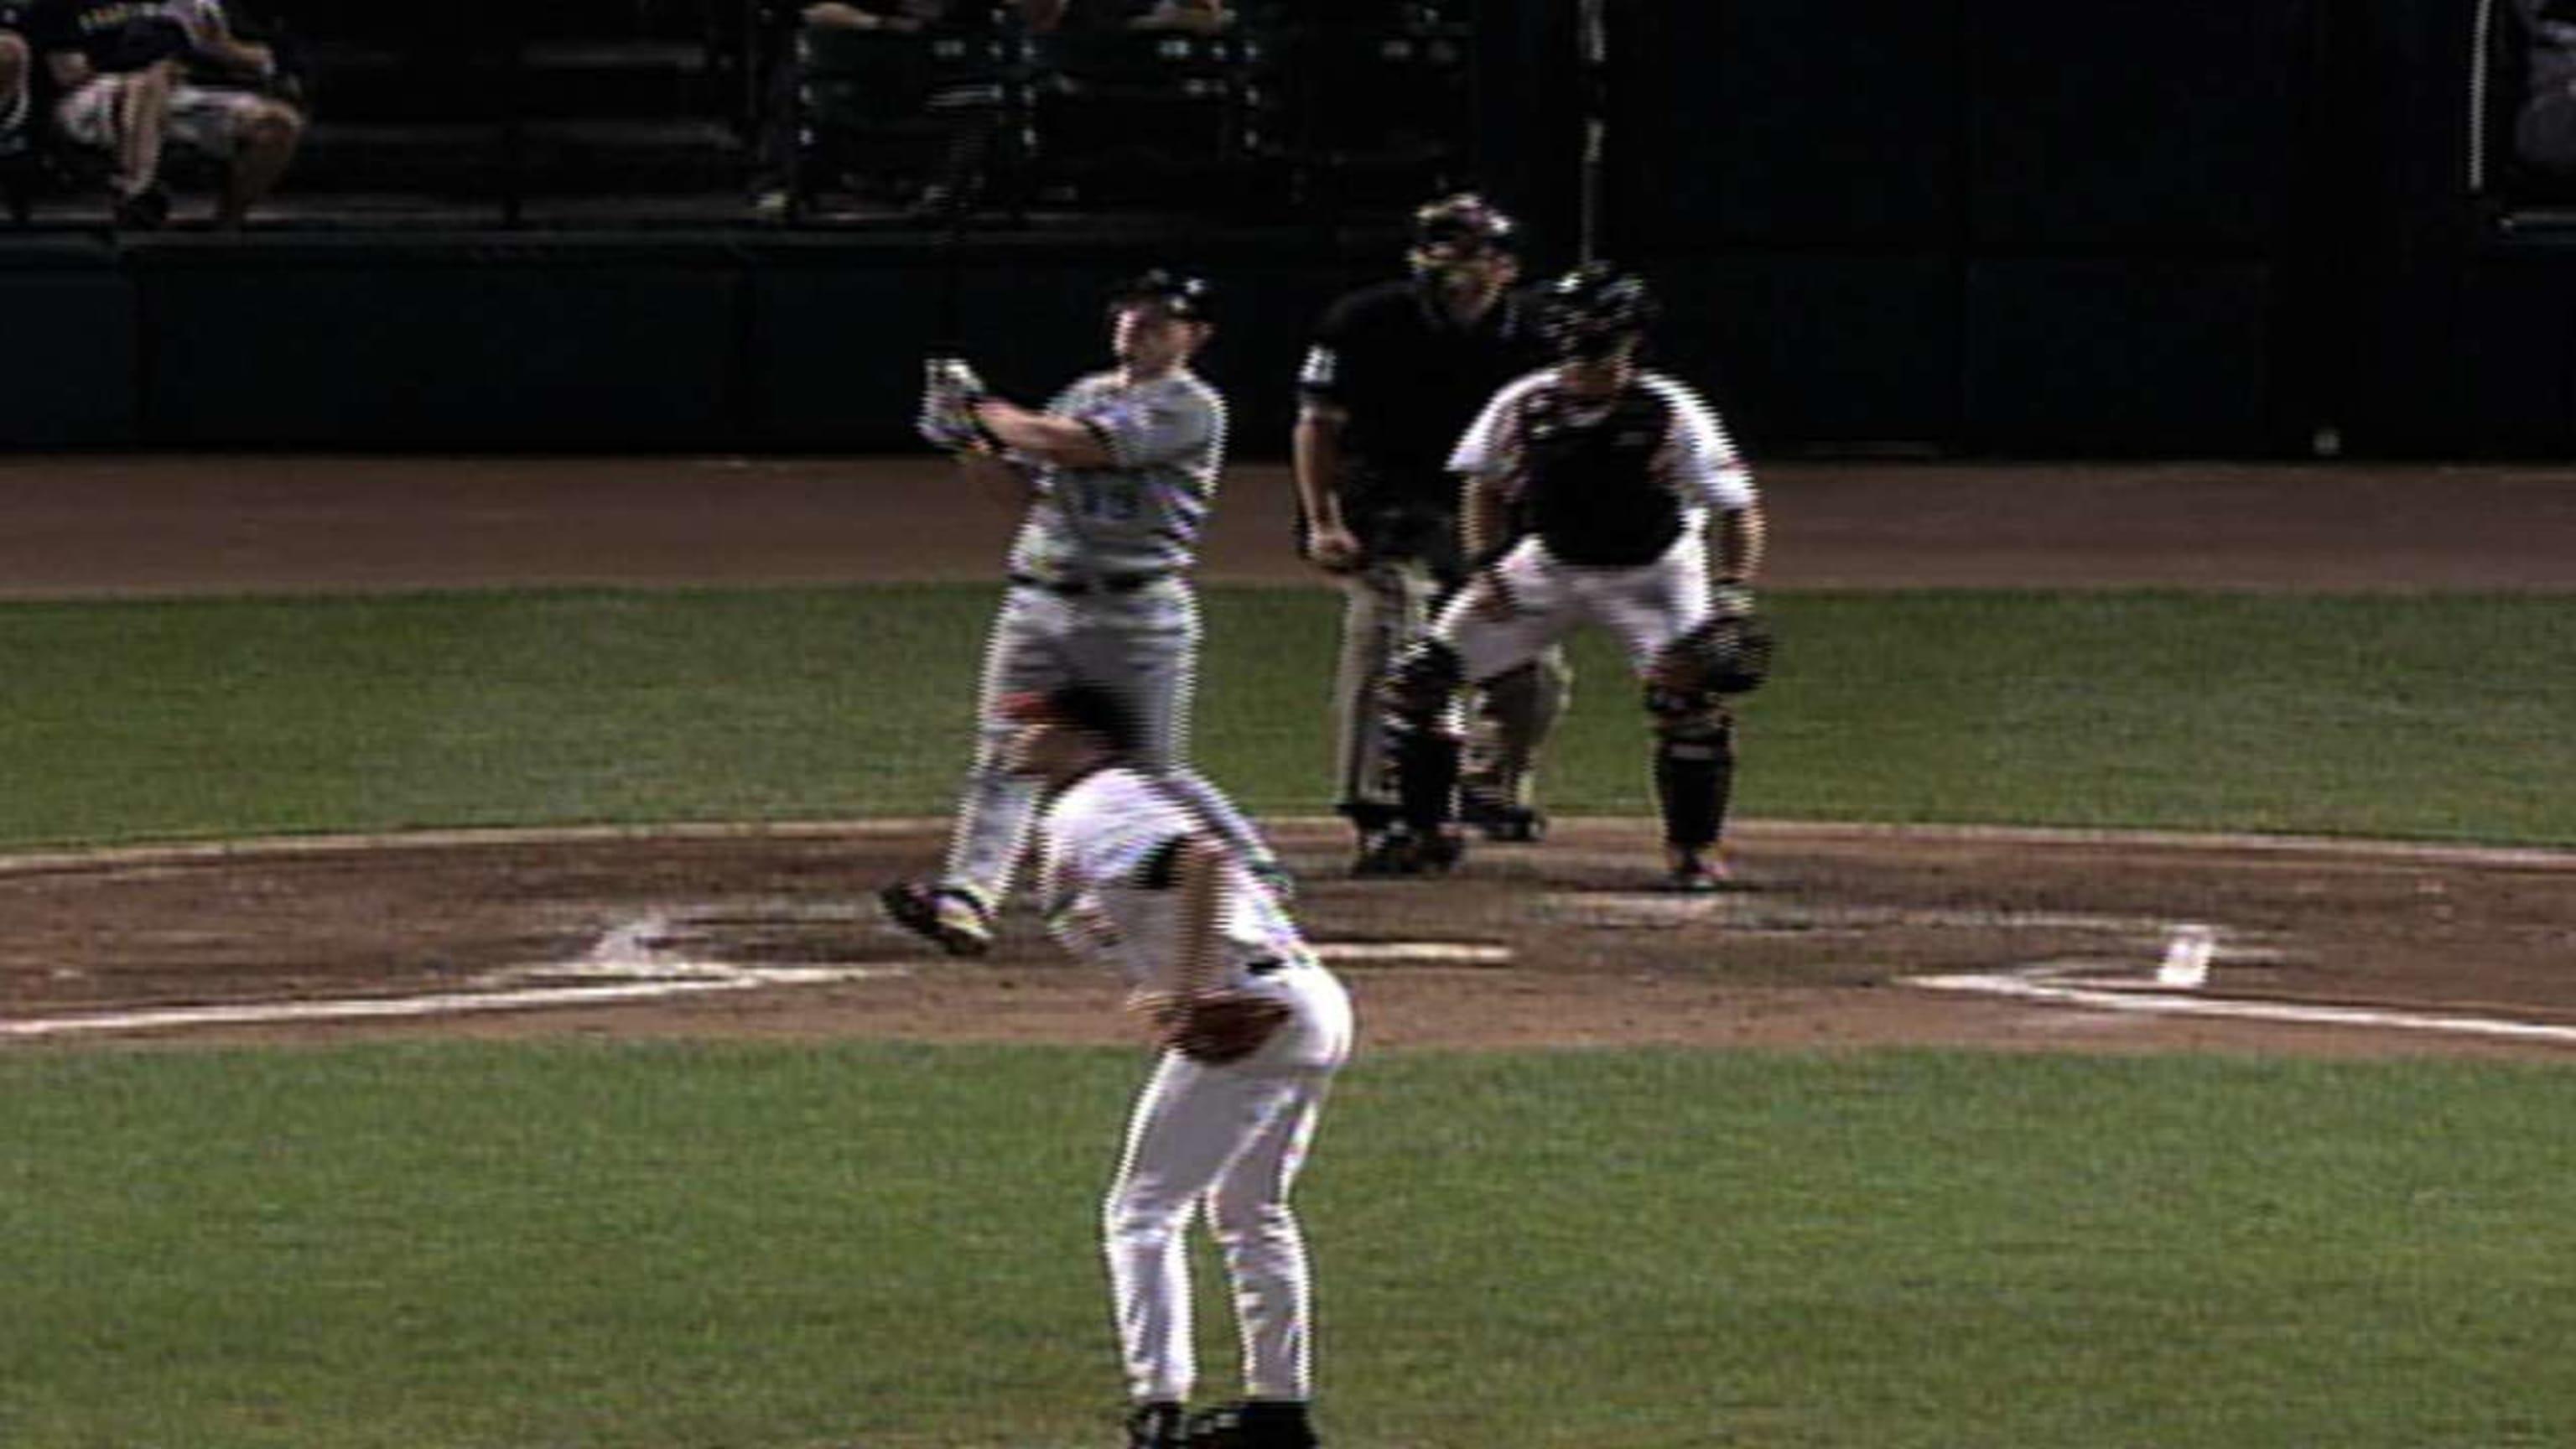 Huff's two-run home run